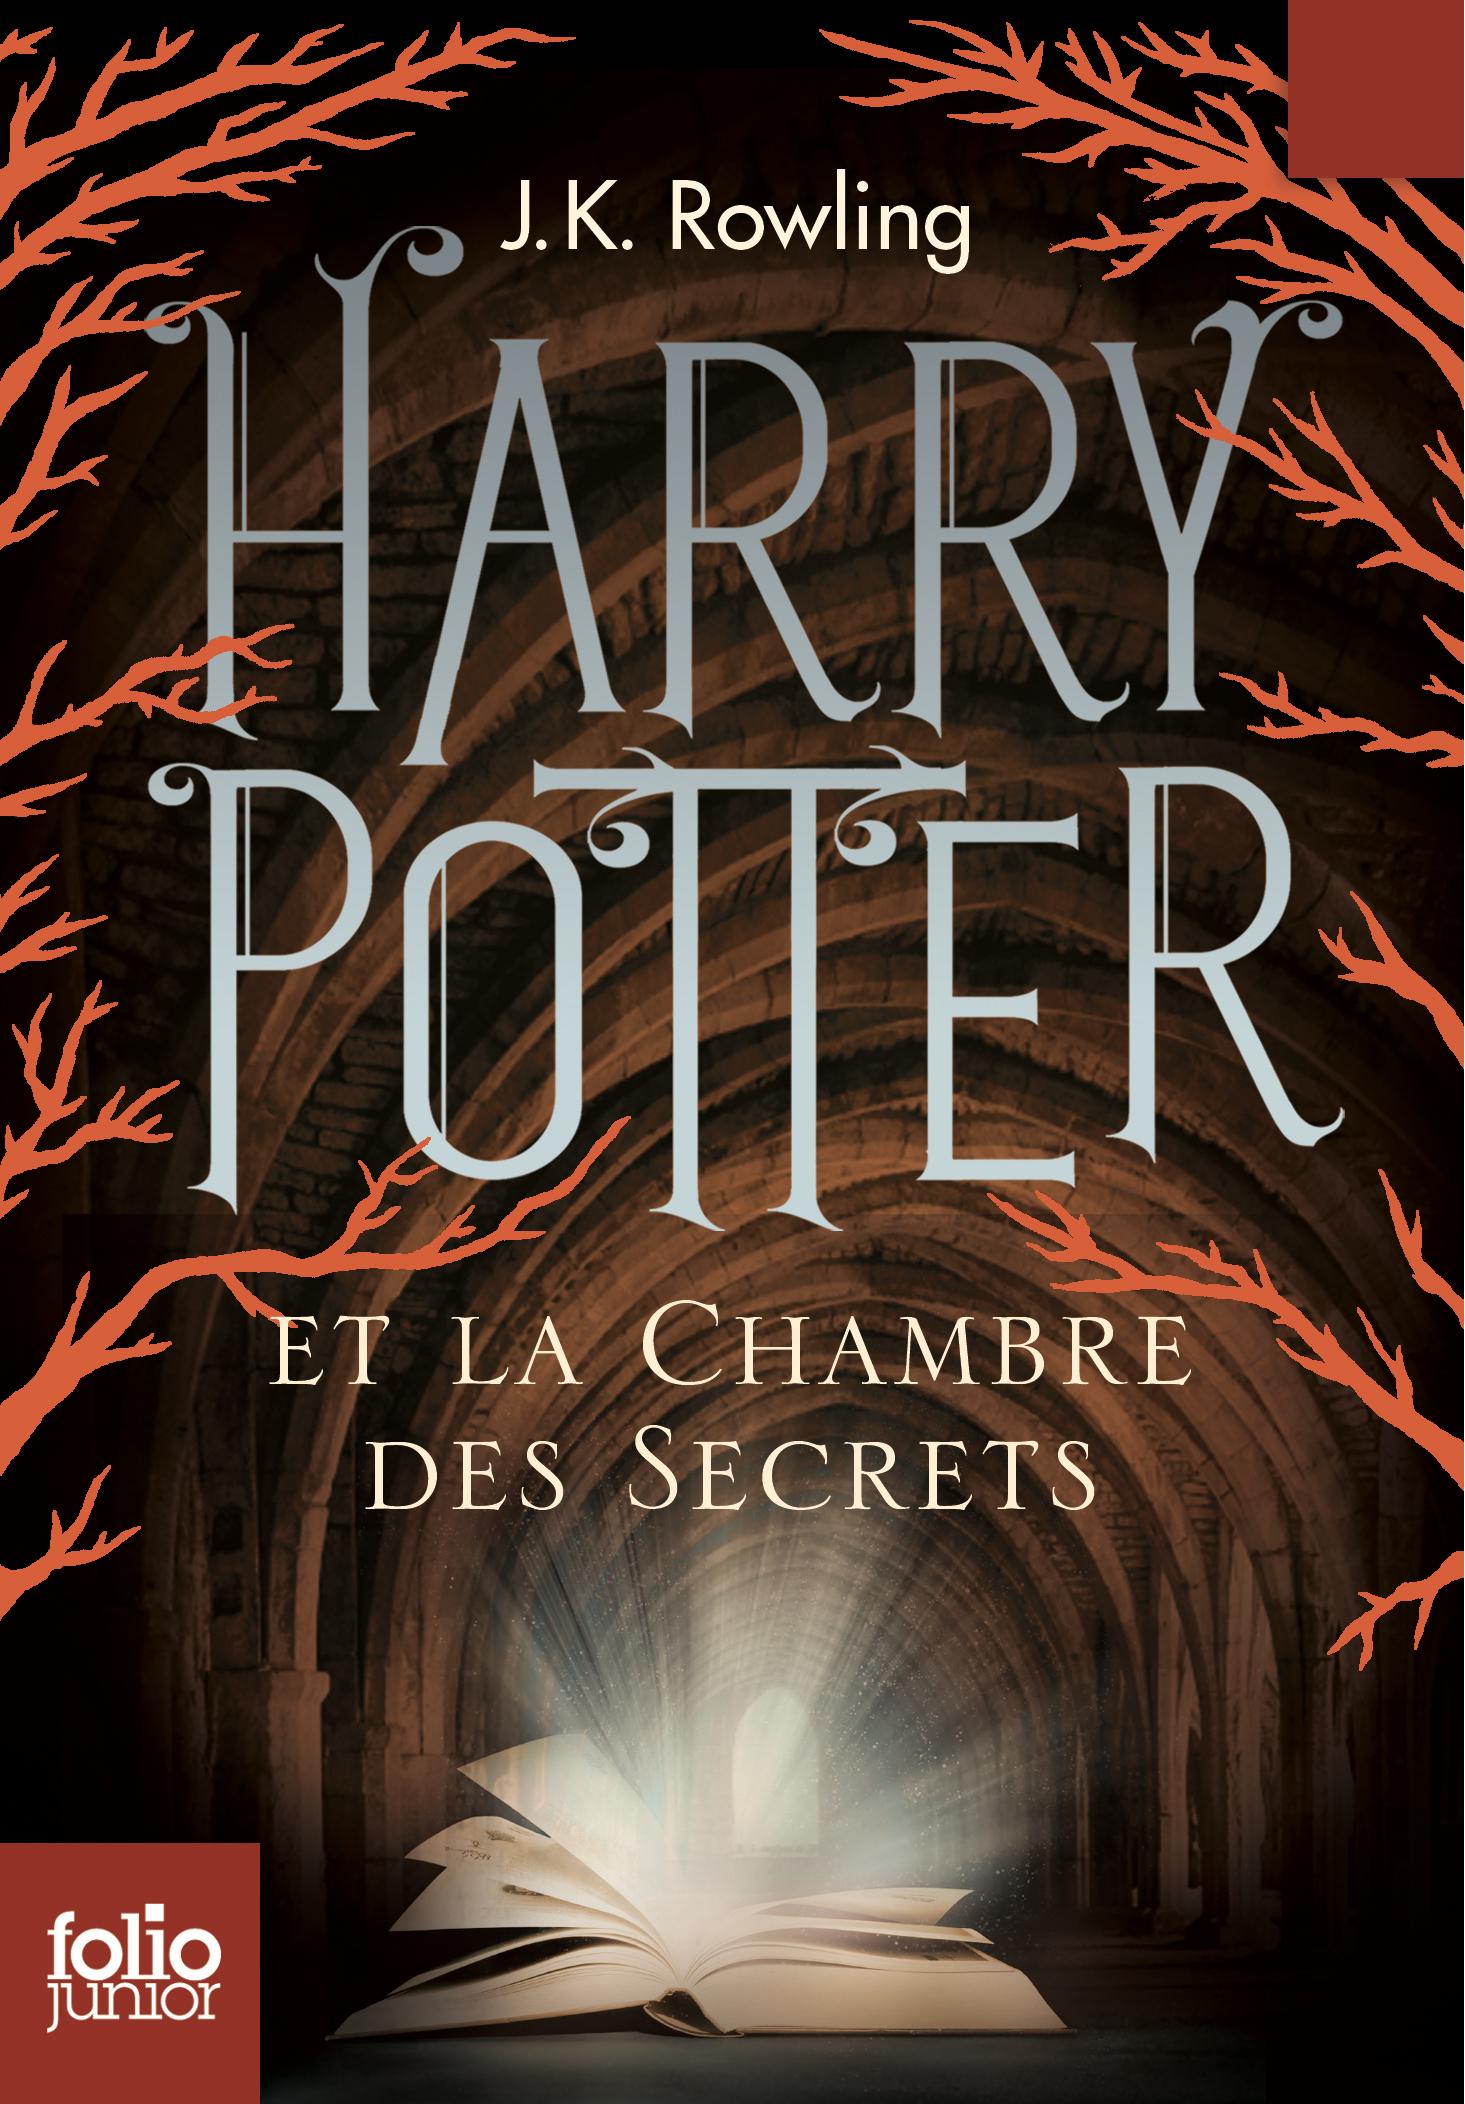 French redesigned Folio Junior cover (2011)